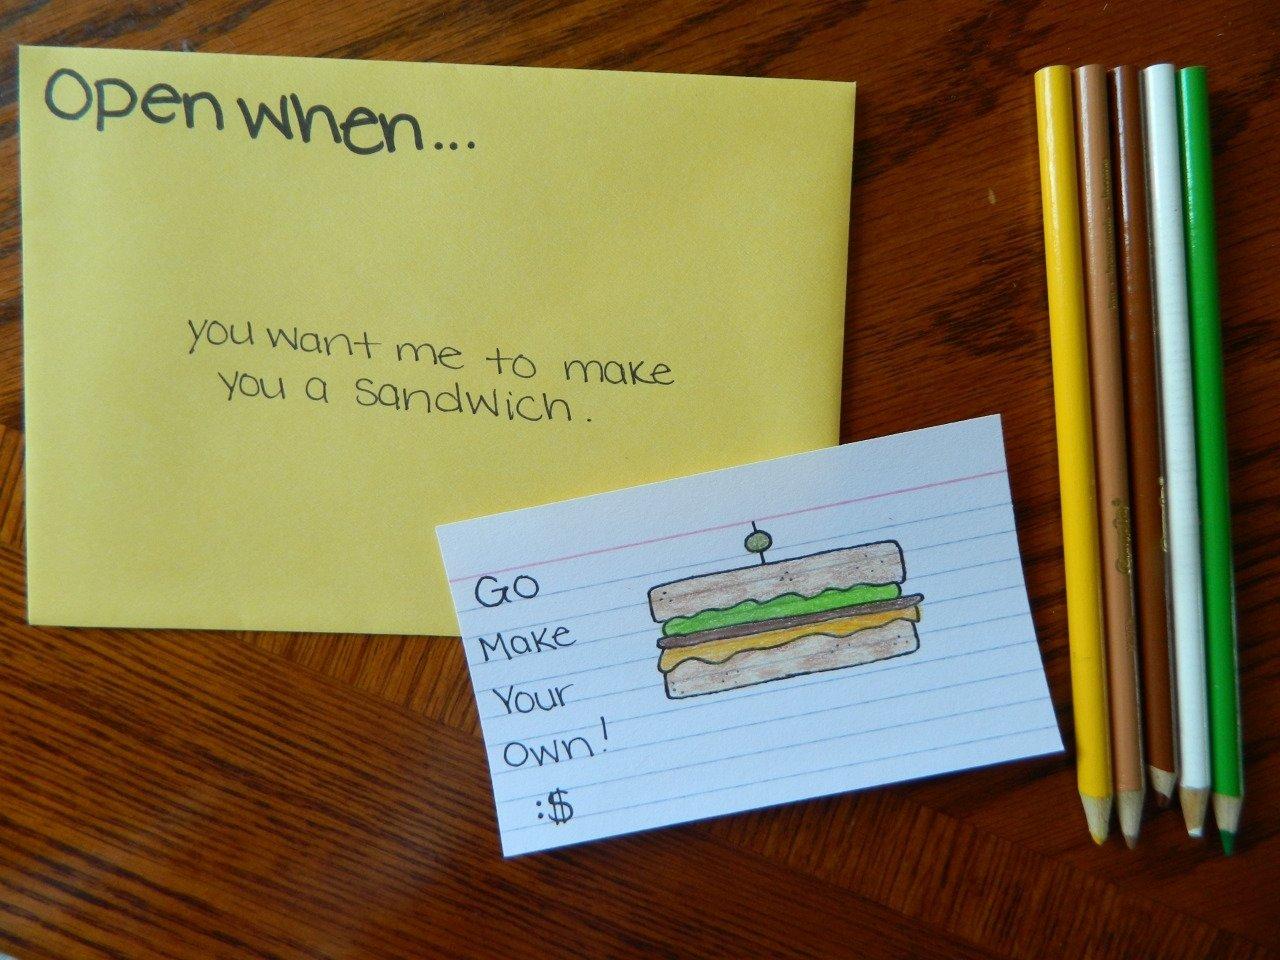 open when | tumblr | open when ideas | pinterest | gift, crafts